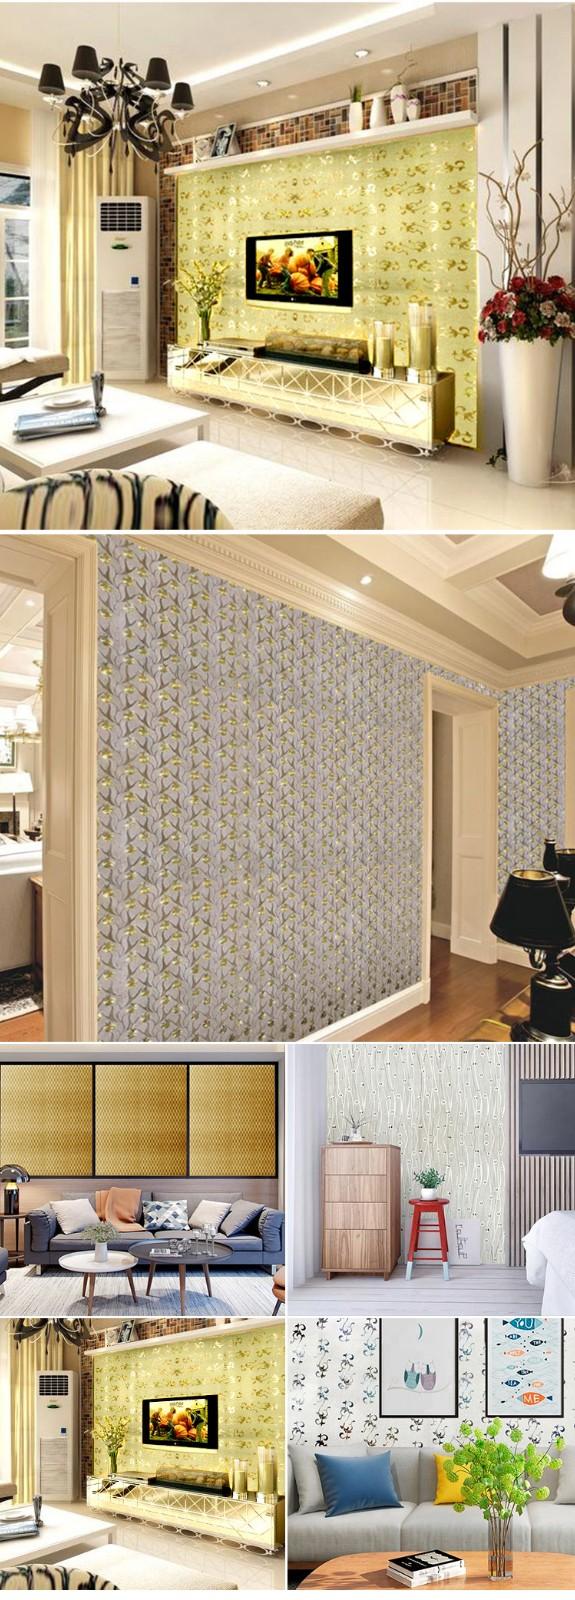 SUNYE factory price kitchen splash tile factory direct supply bulk buy-6